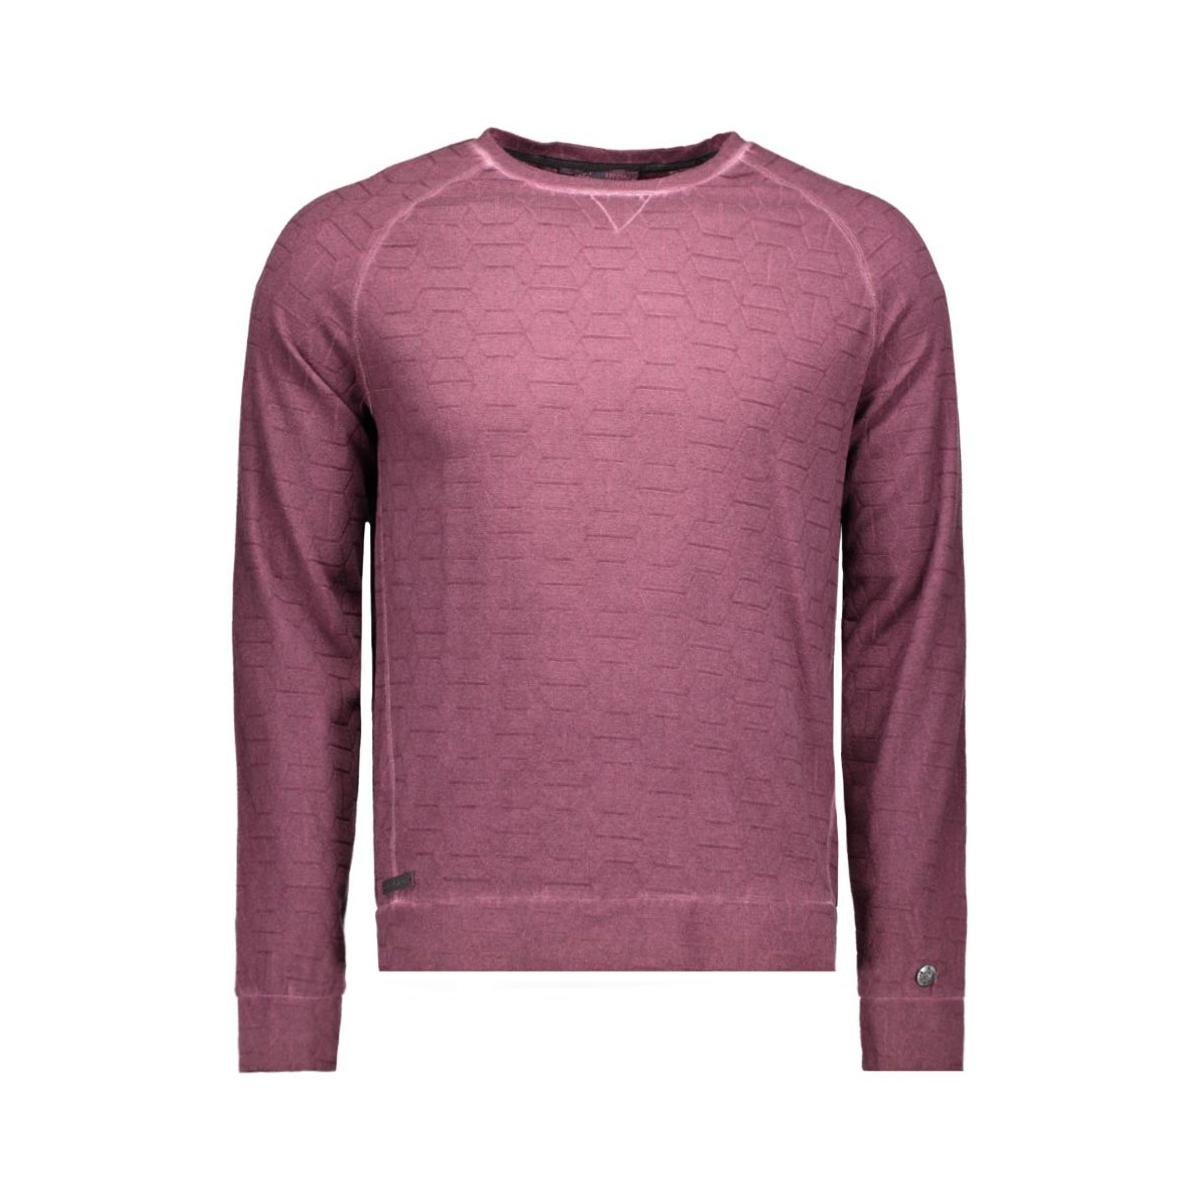 cts66309 cast iron sweater 3808